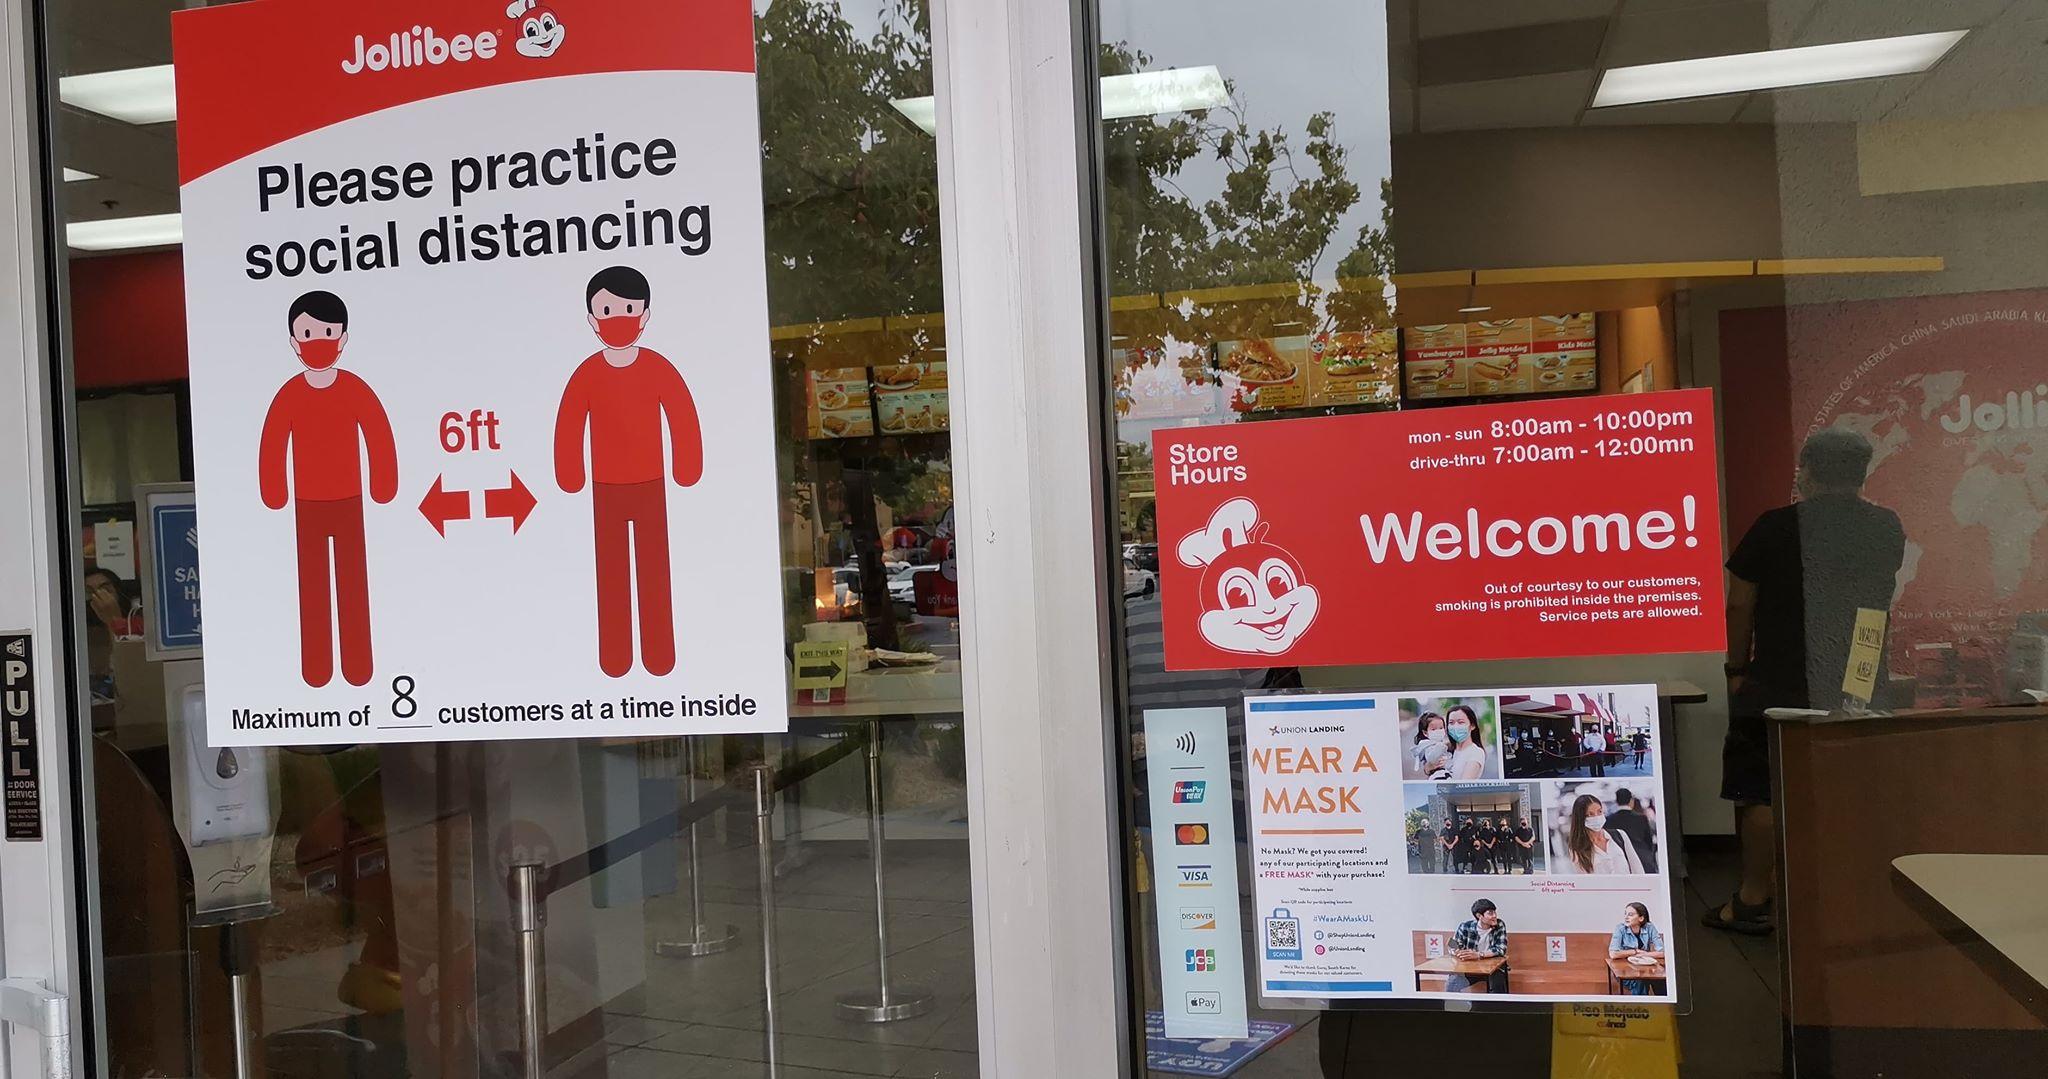 social distancing sign at Jollibee